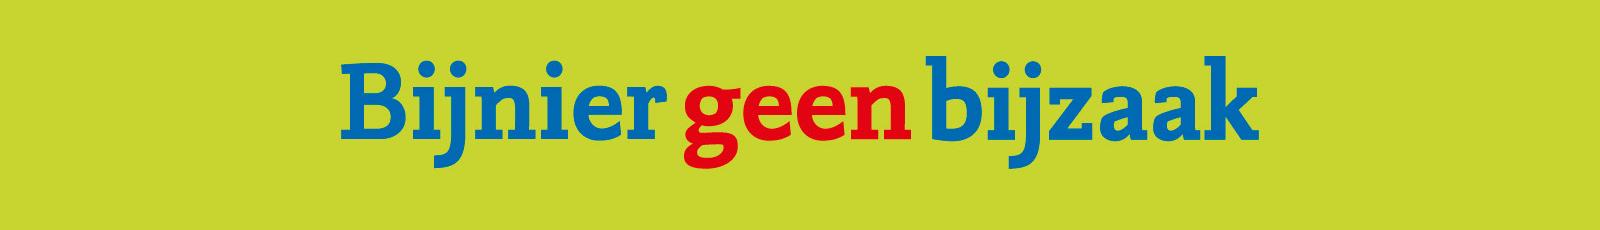 logo http://www.bijniergeenbijzaak.nl